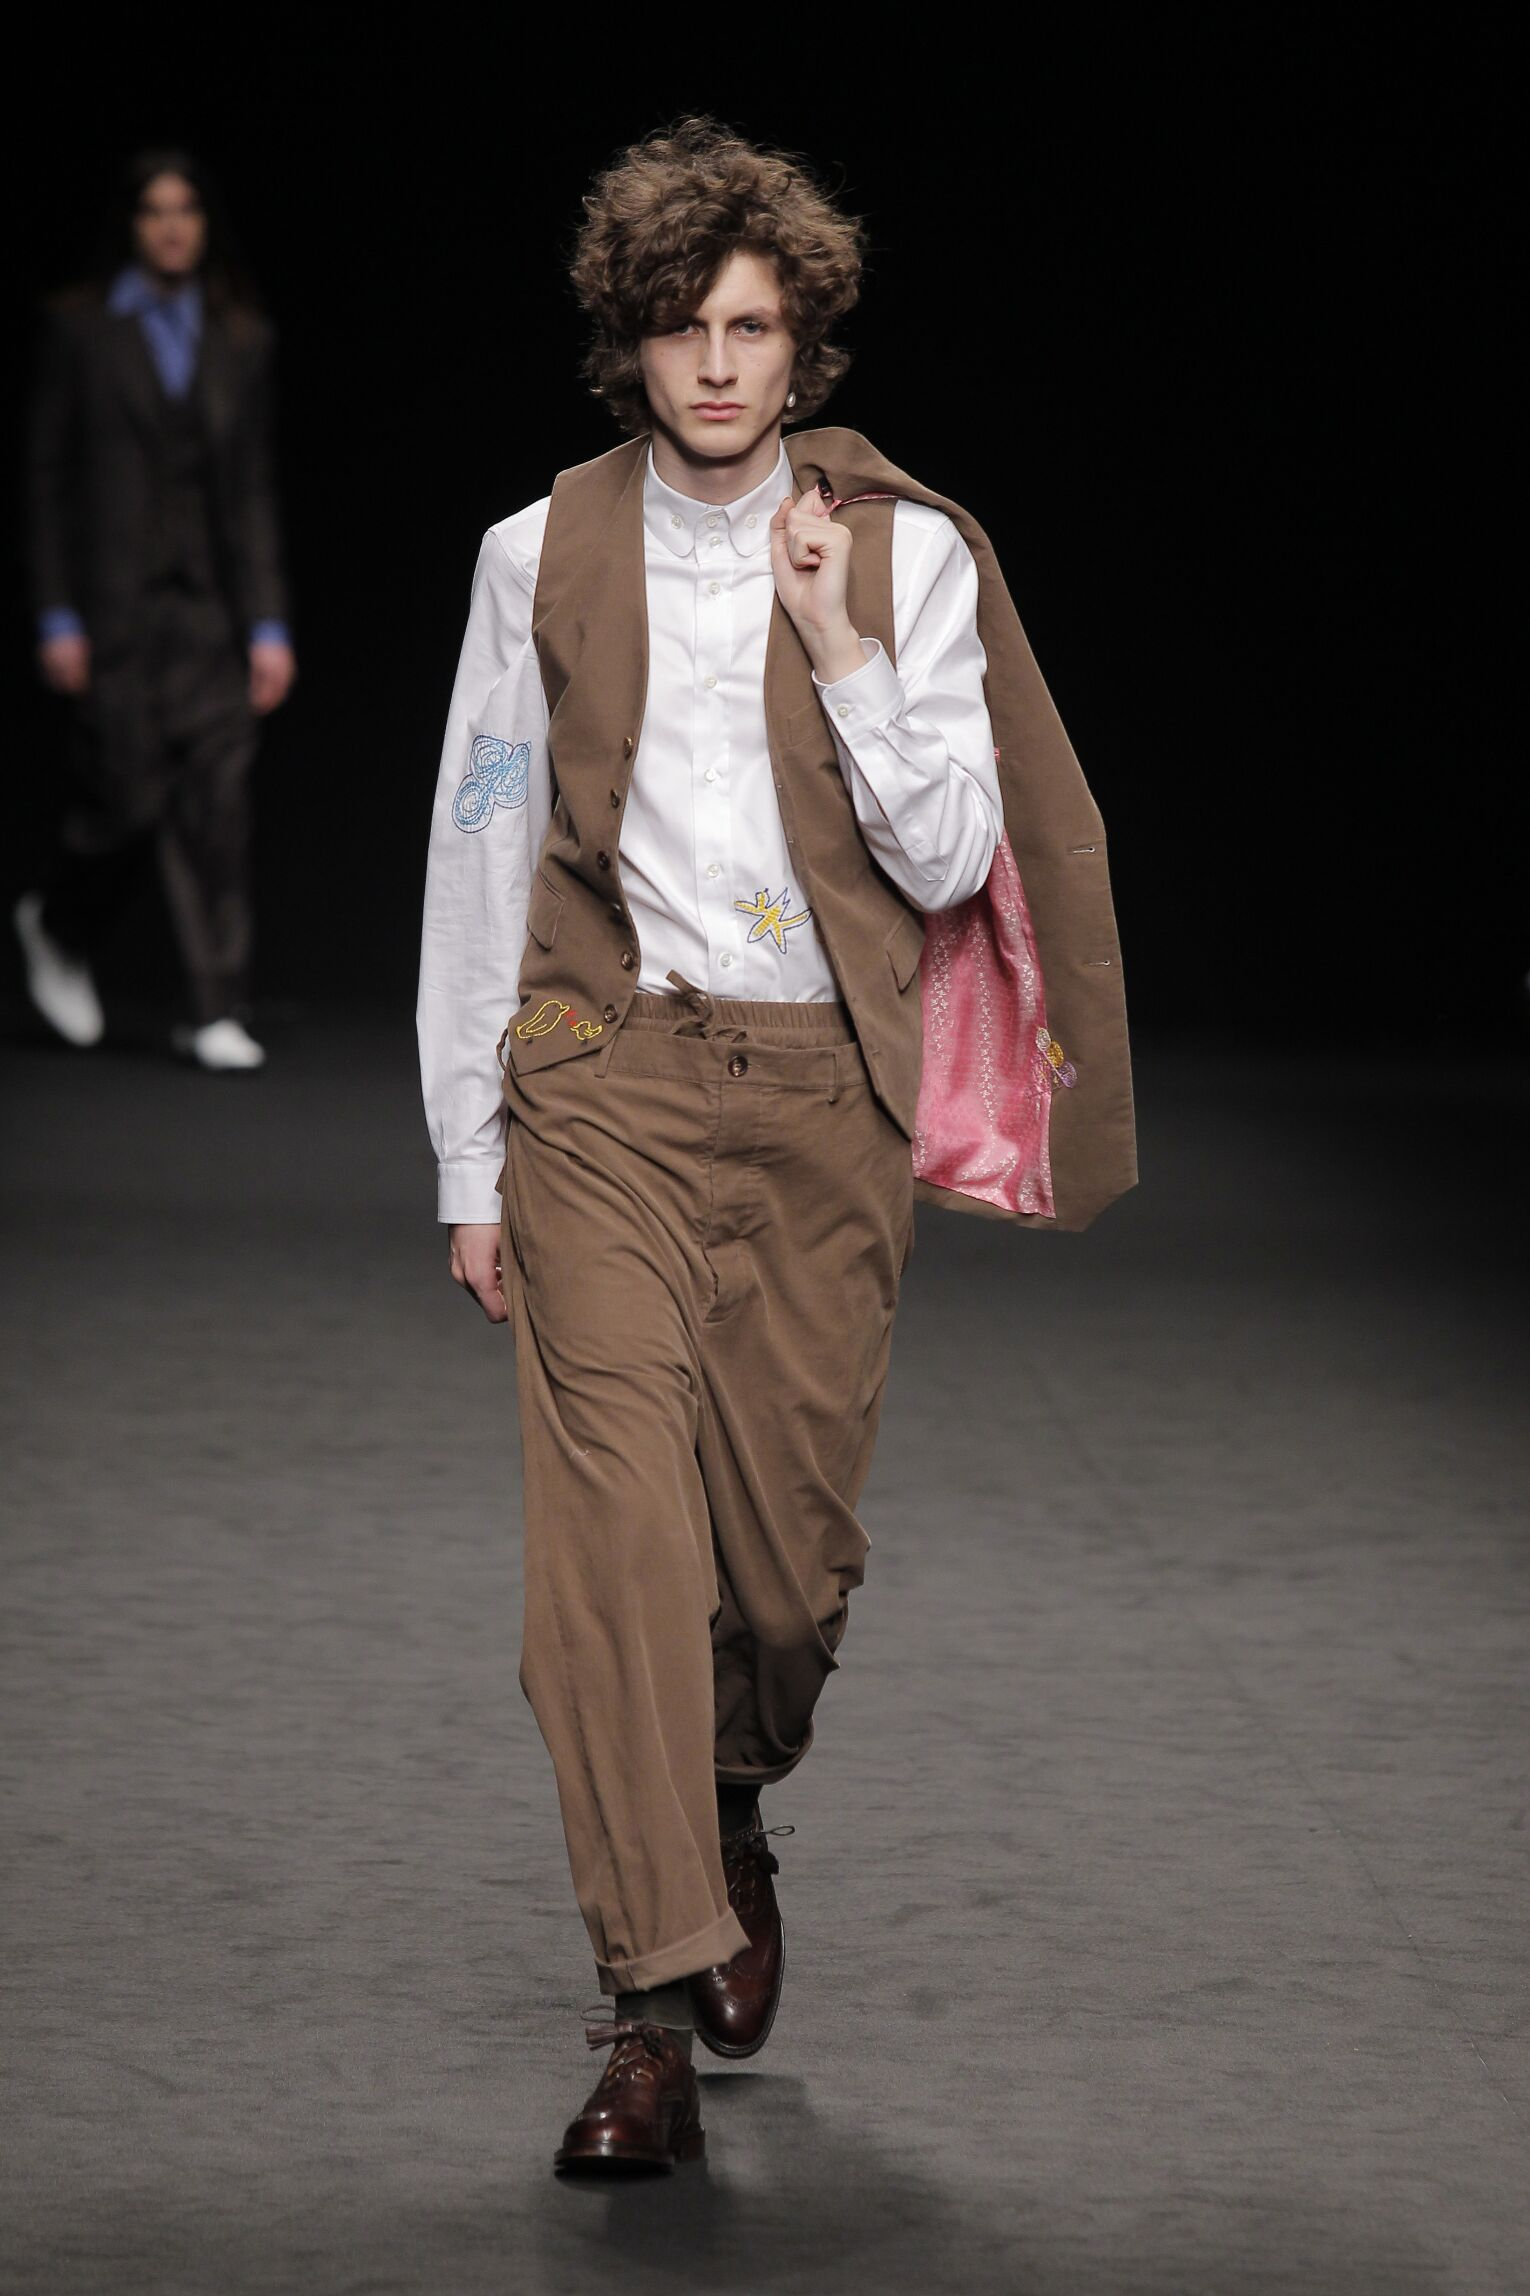 Vivienne Westwood Fall Winter 2016 Mens Collection Milan Fashion Week